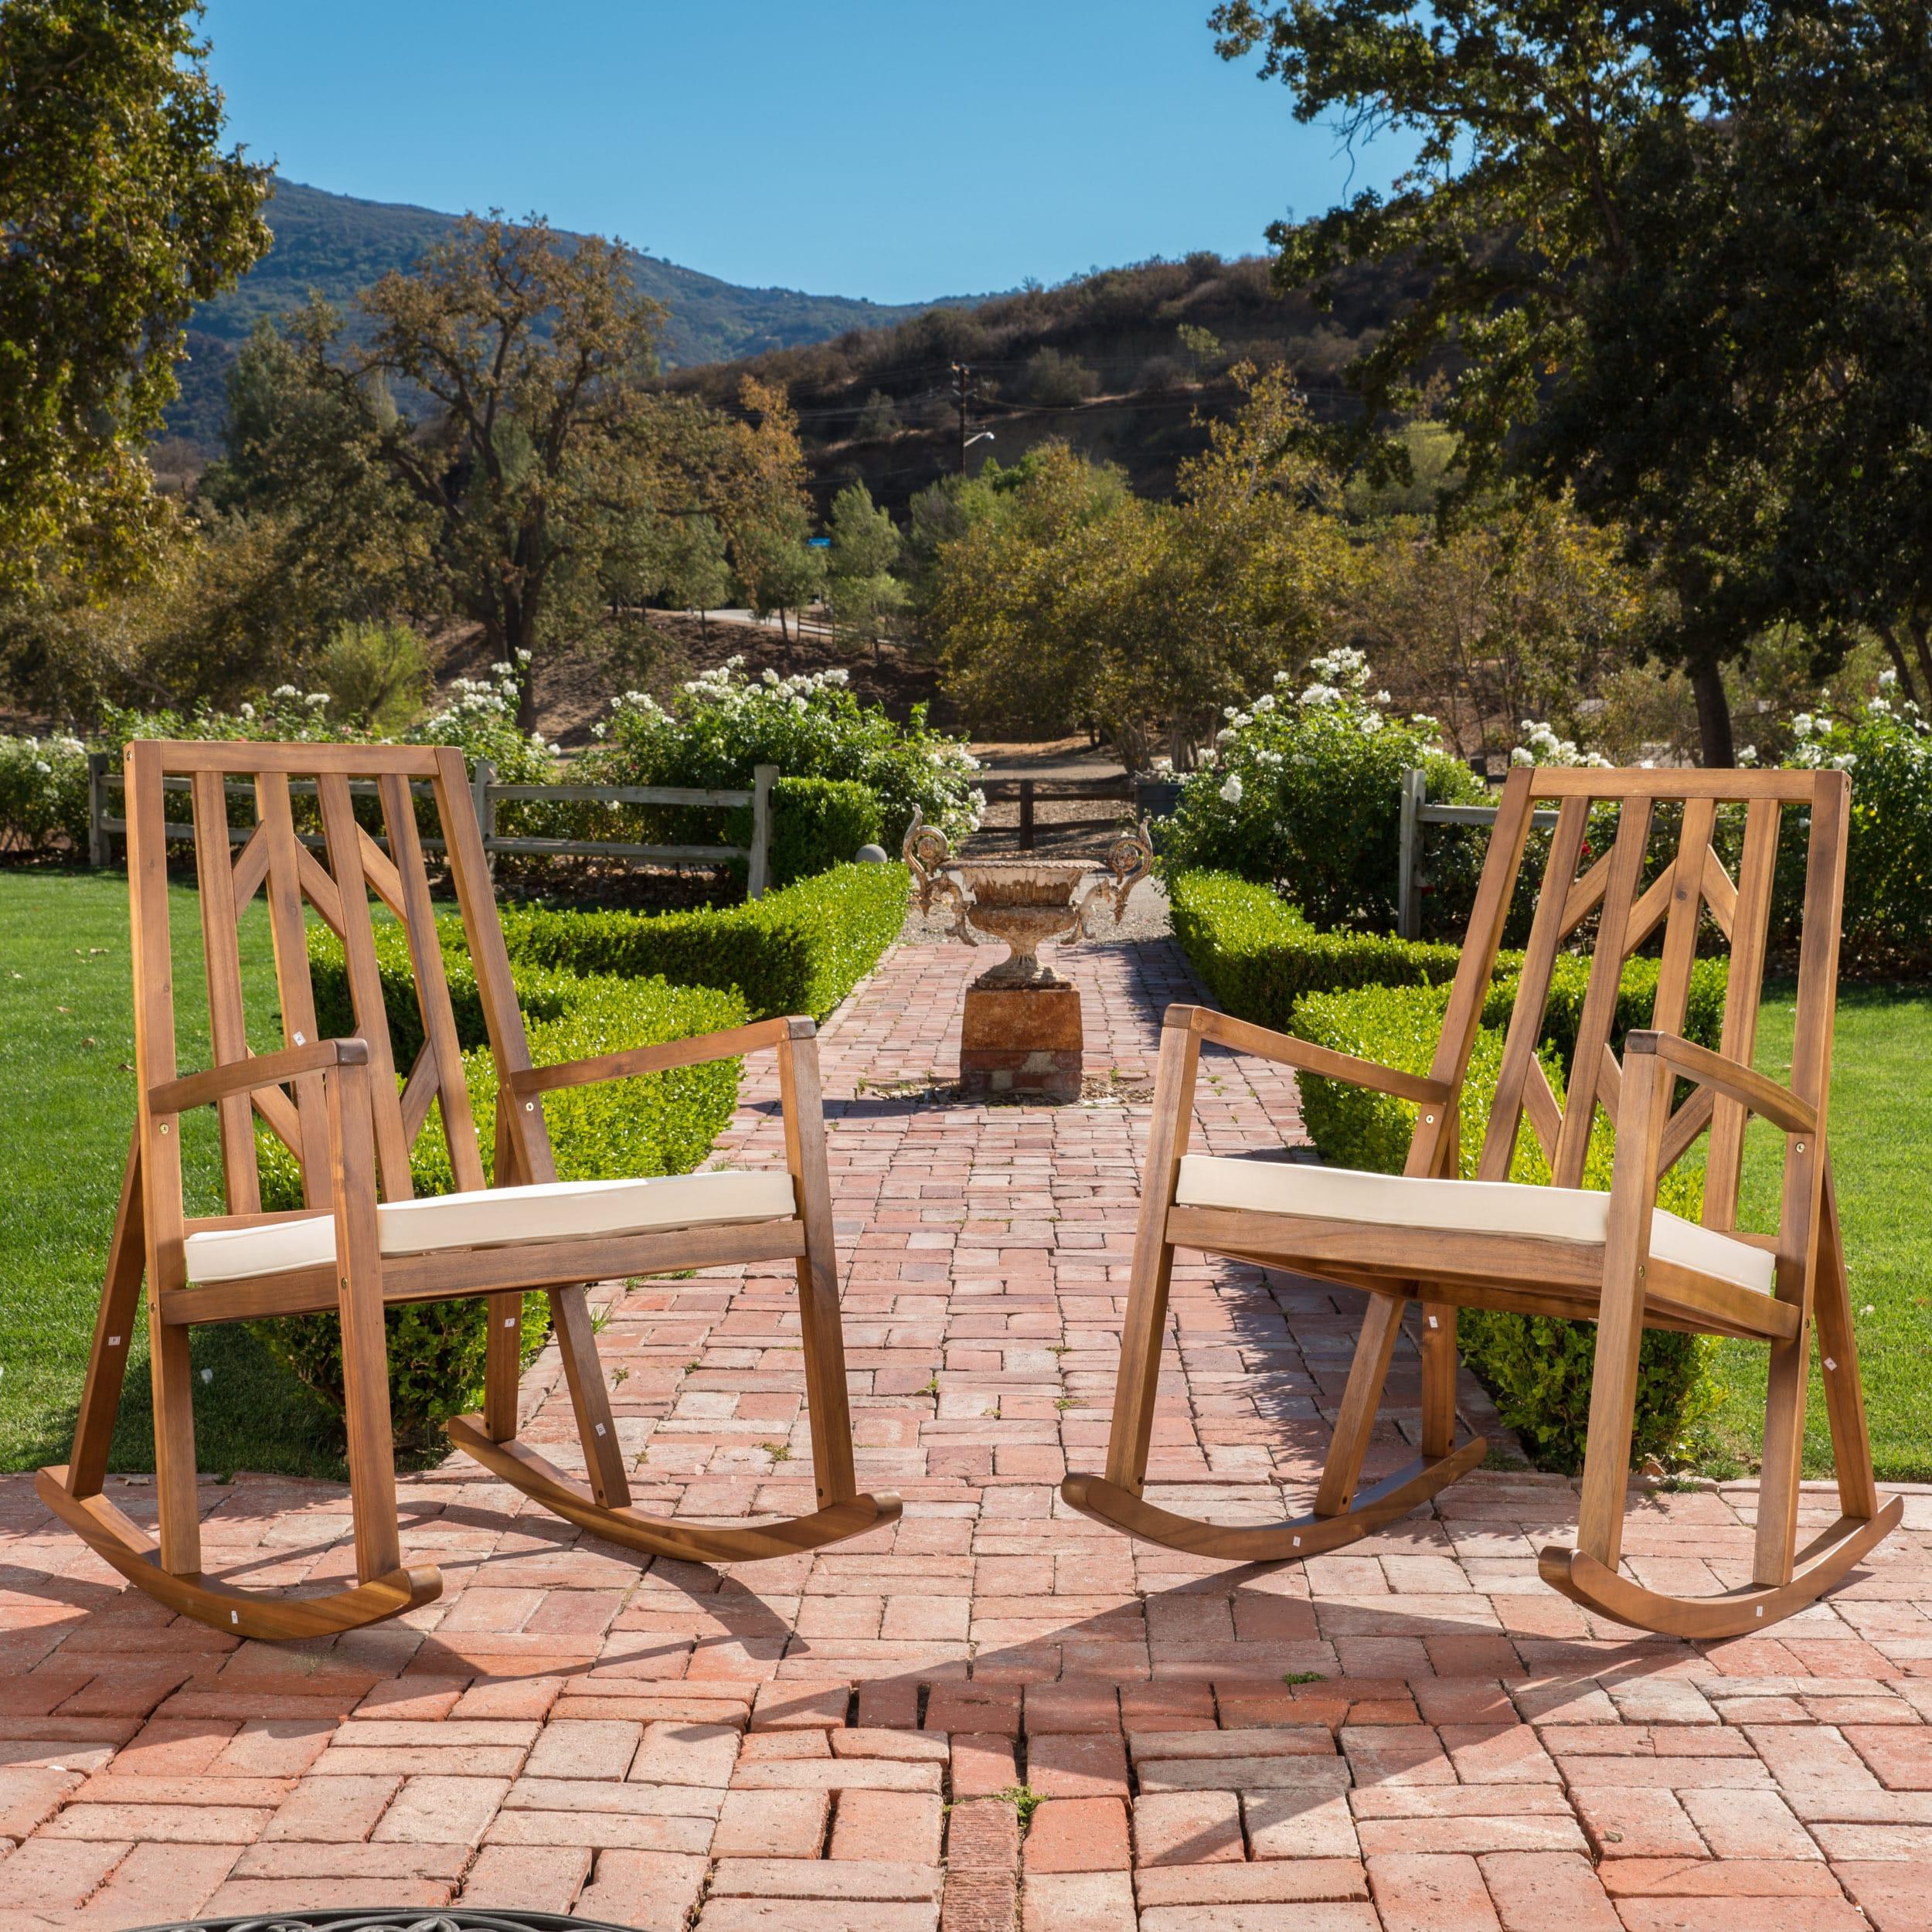 Nuna Outdoor Wood Rocking Chair w/ Cushion (Set of 2) by ...